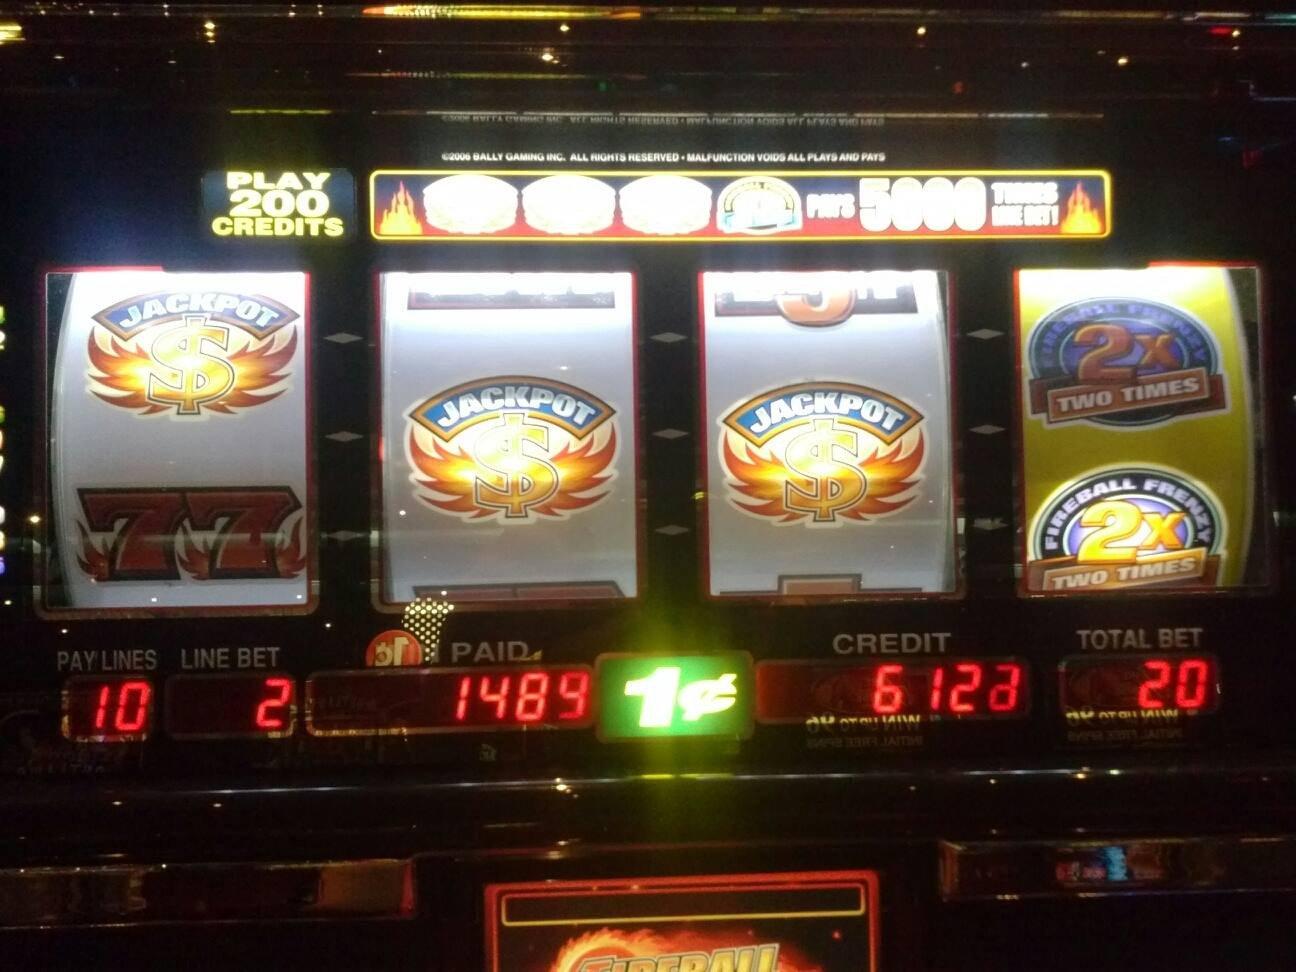 Driving directions sands casino bethlehem pa